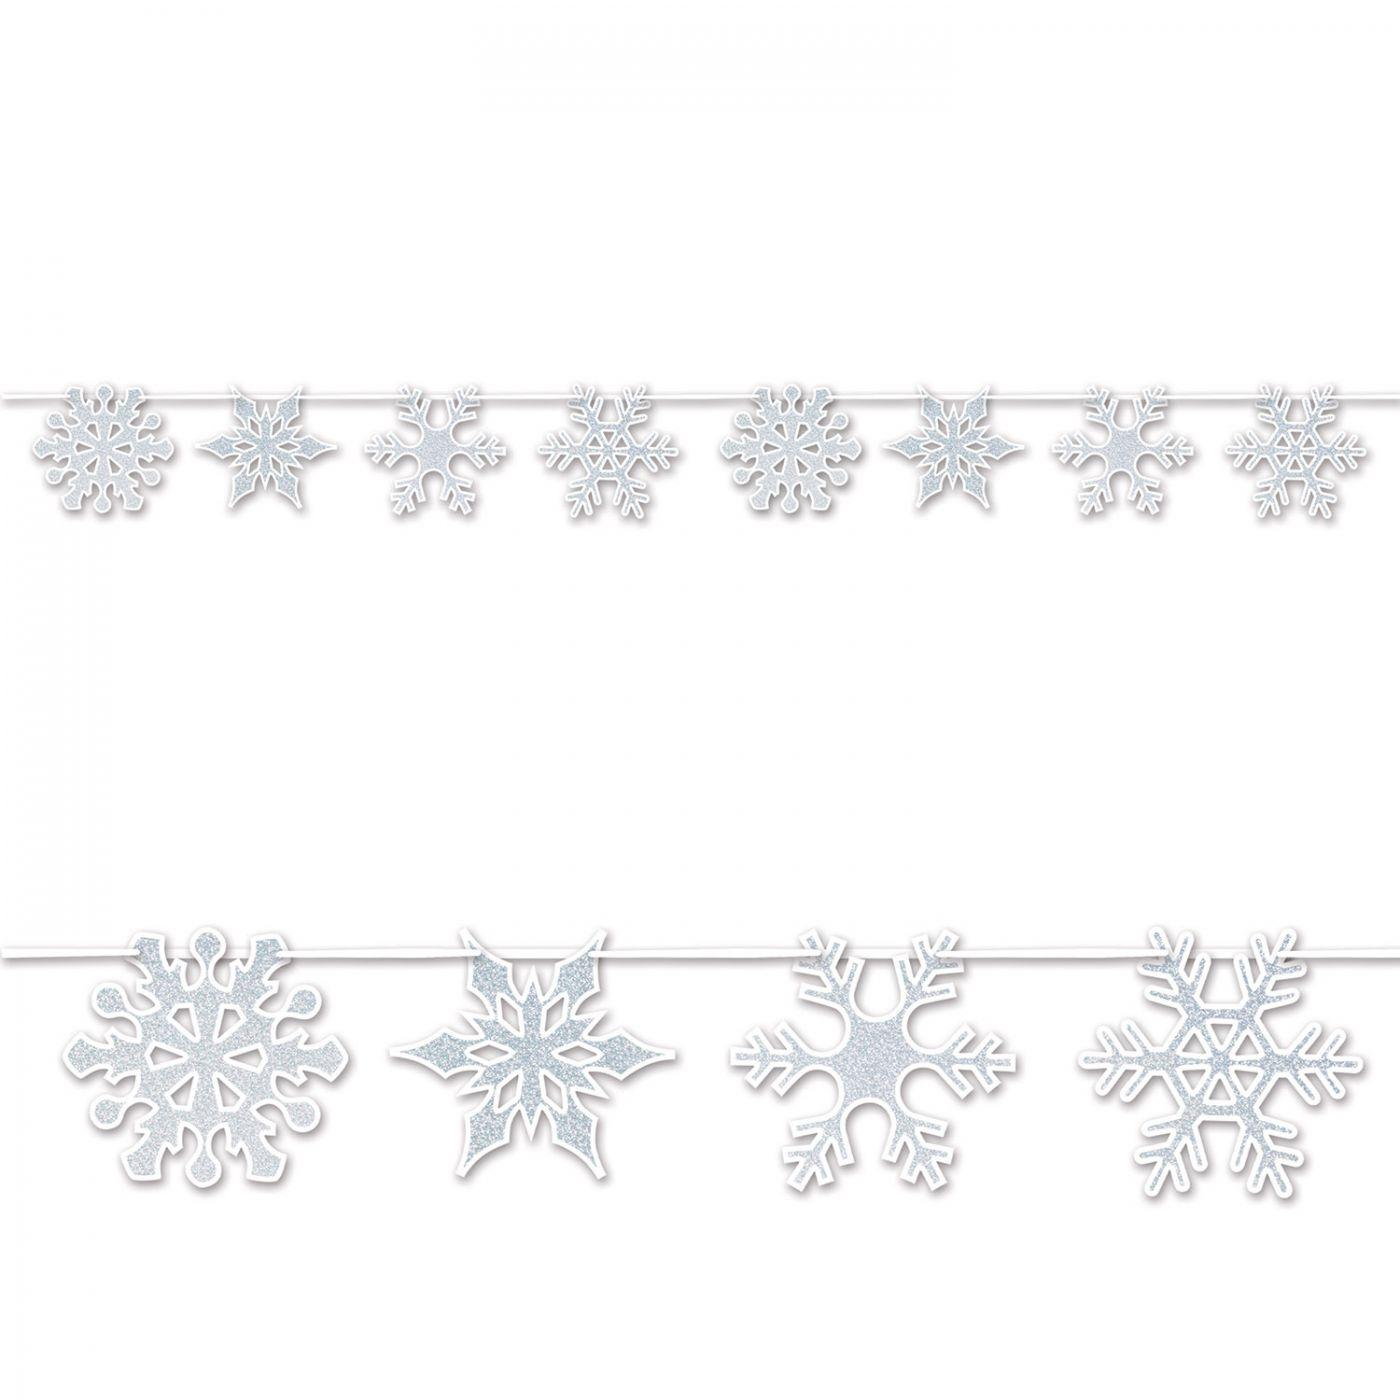 Snowflake Streamer image